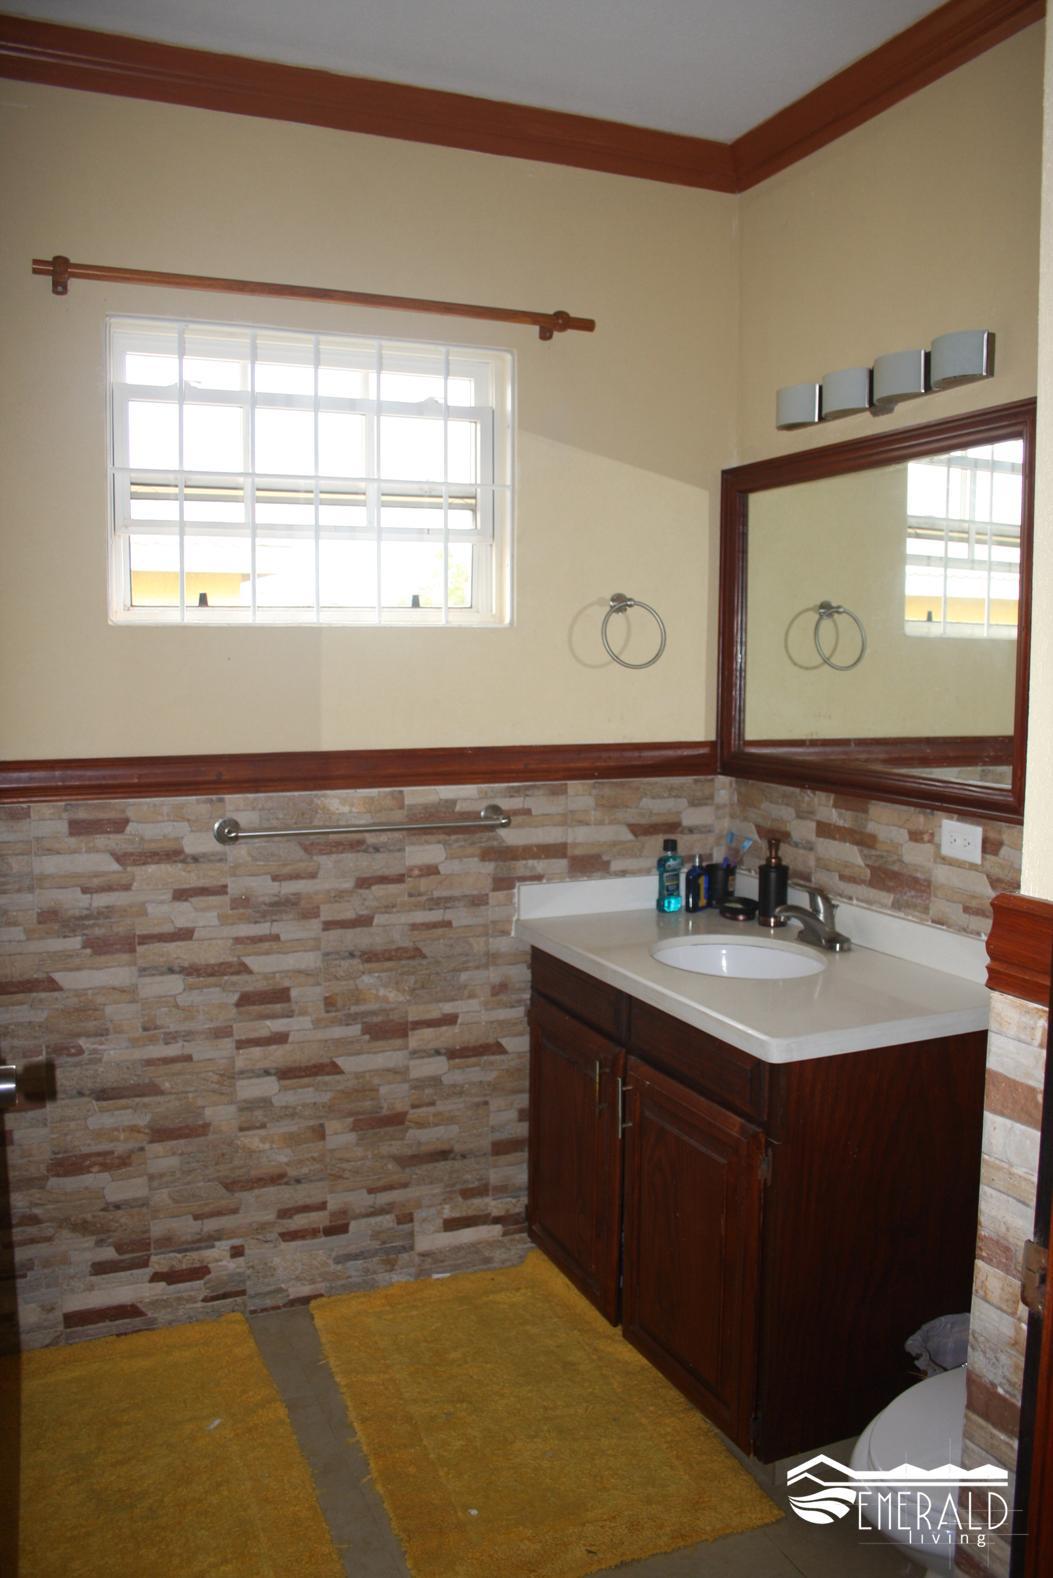 EMERALD LIVING | Downstairs Bathroom